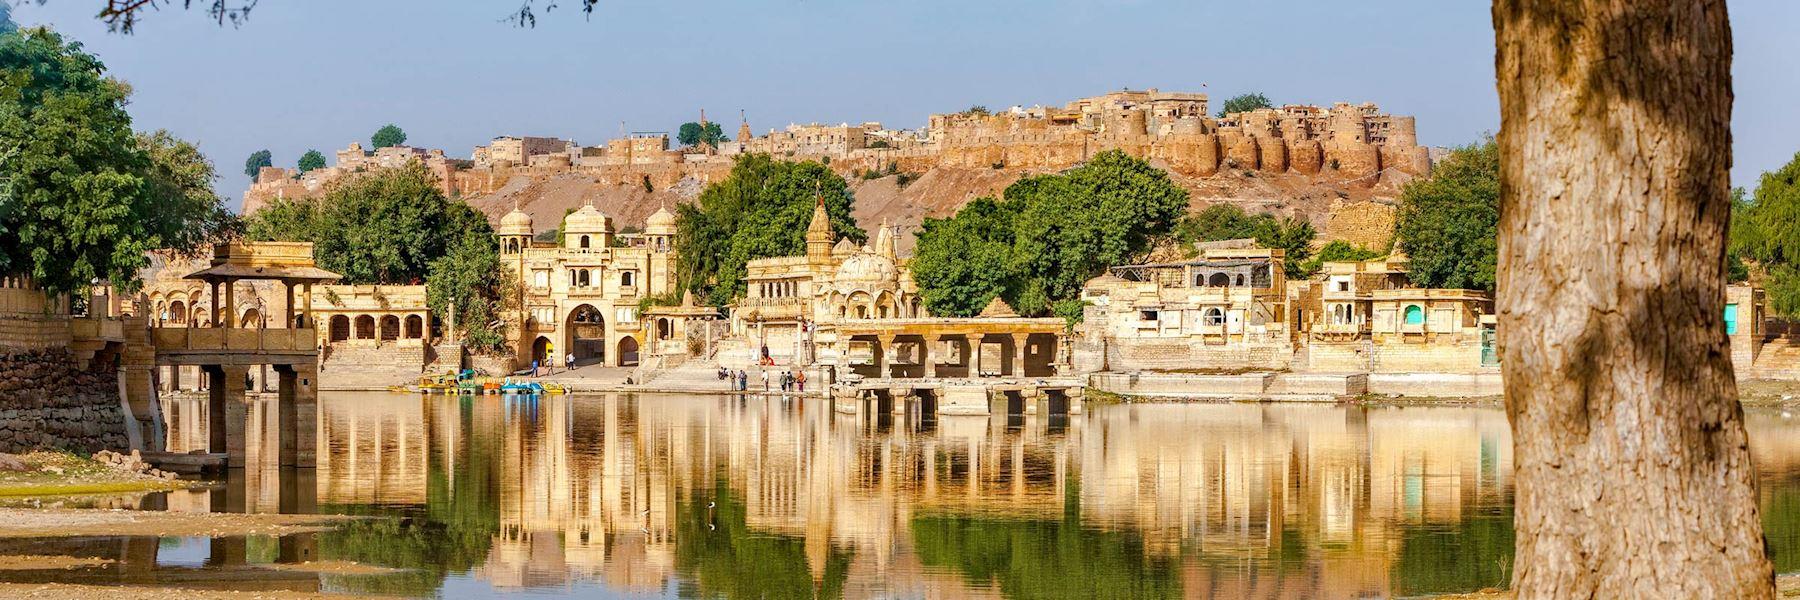 Visit Jaisalmer, India